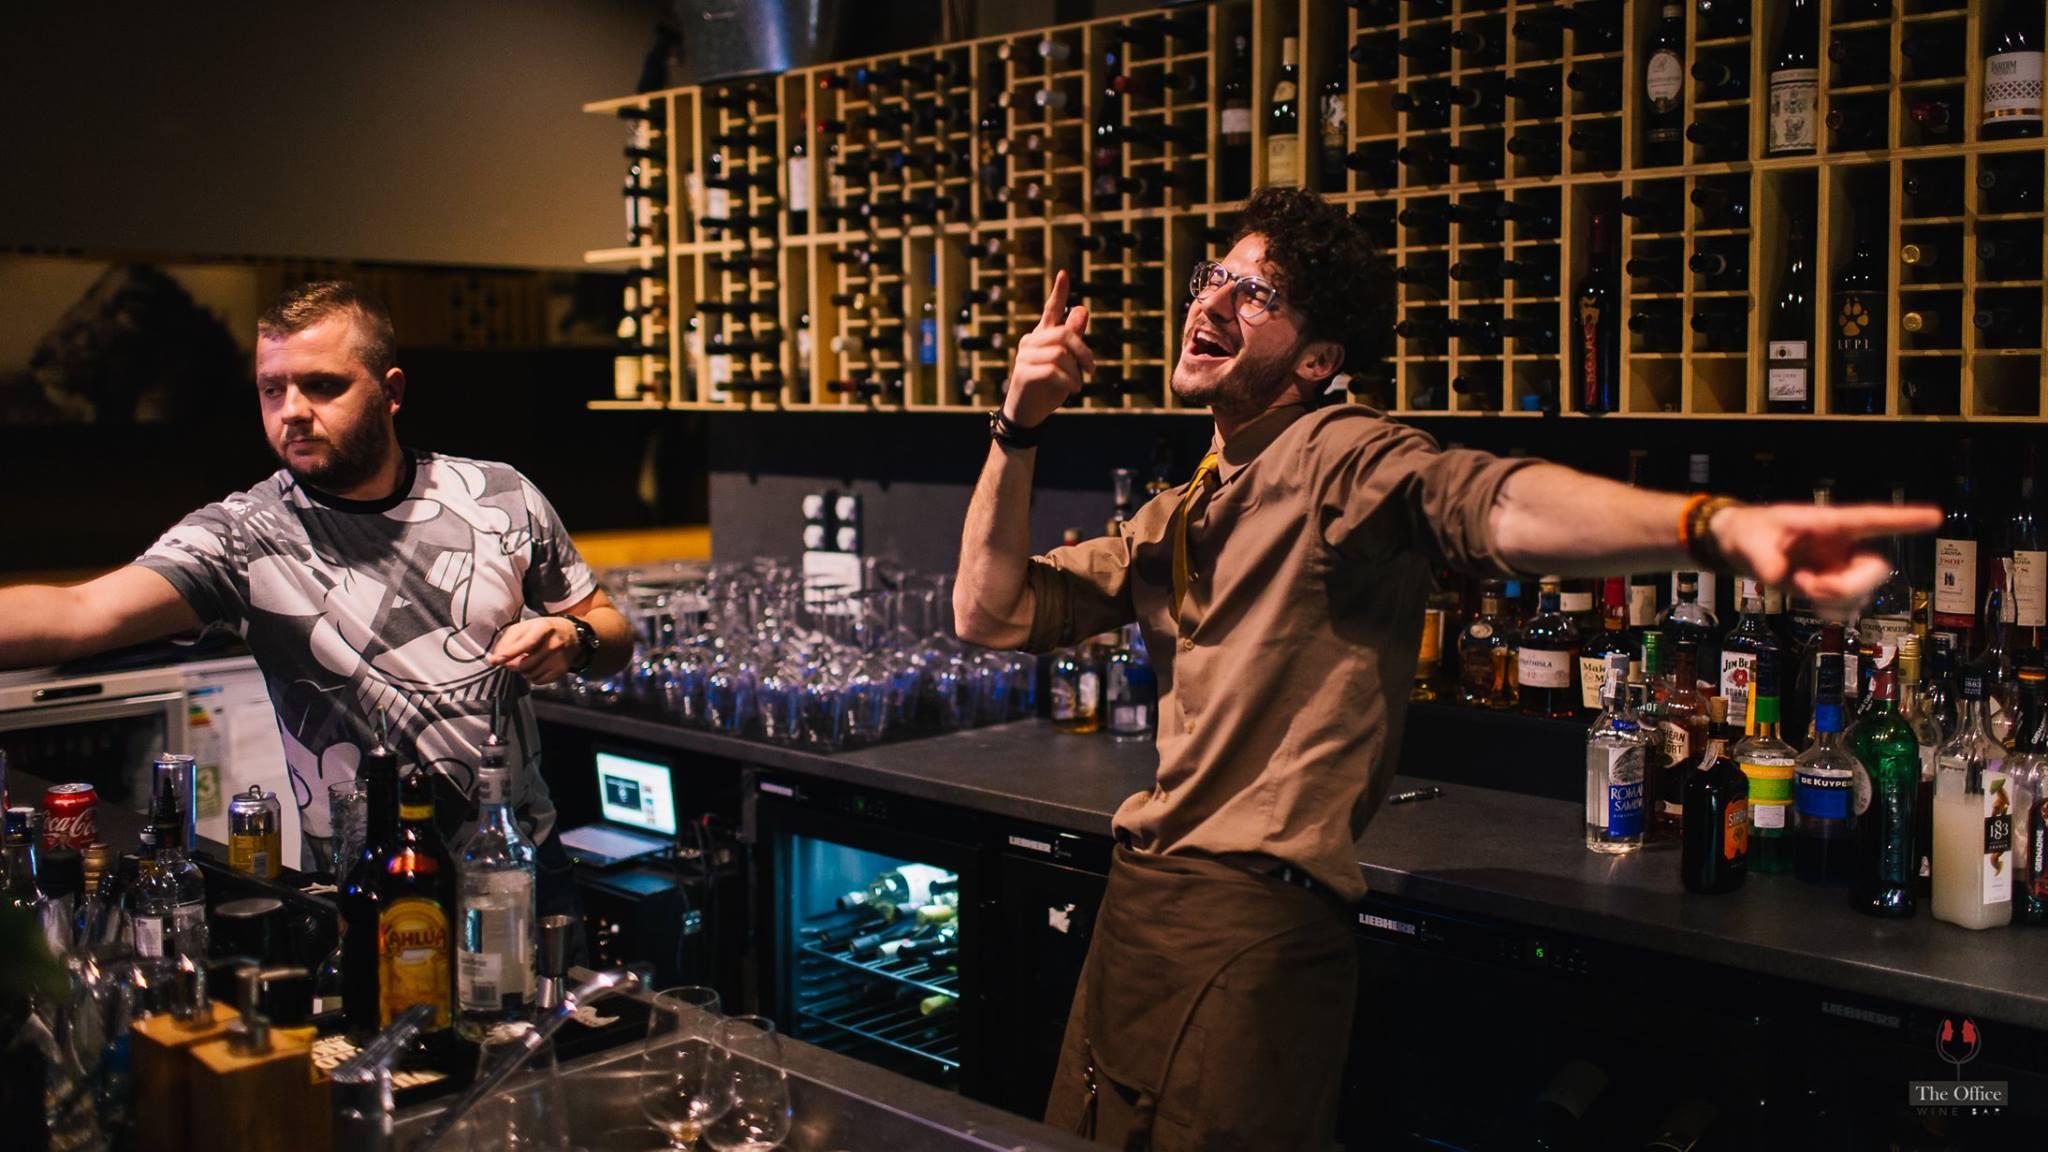 barman the office wine bar